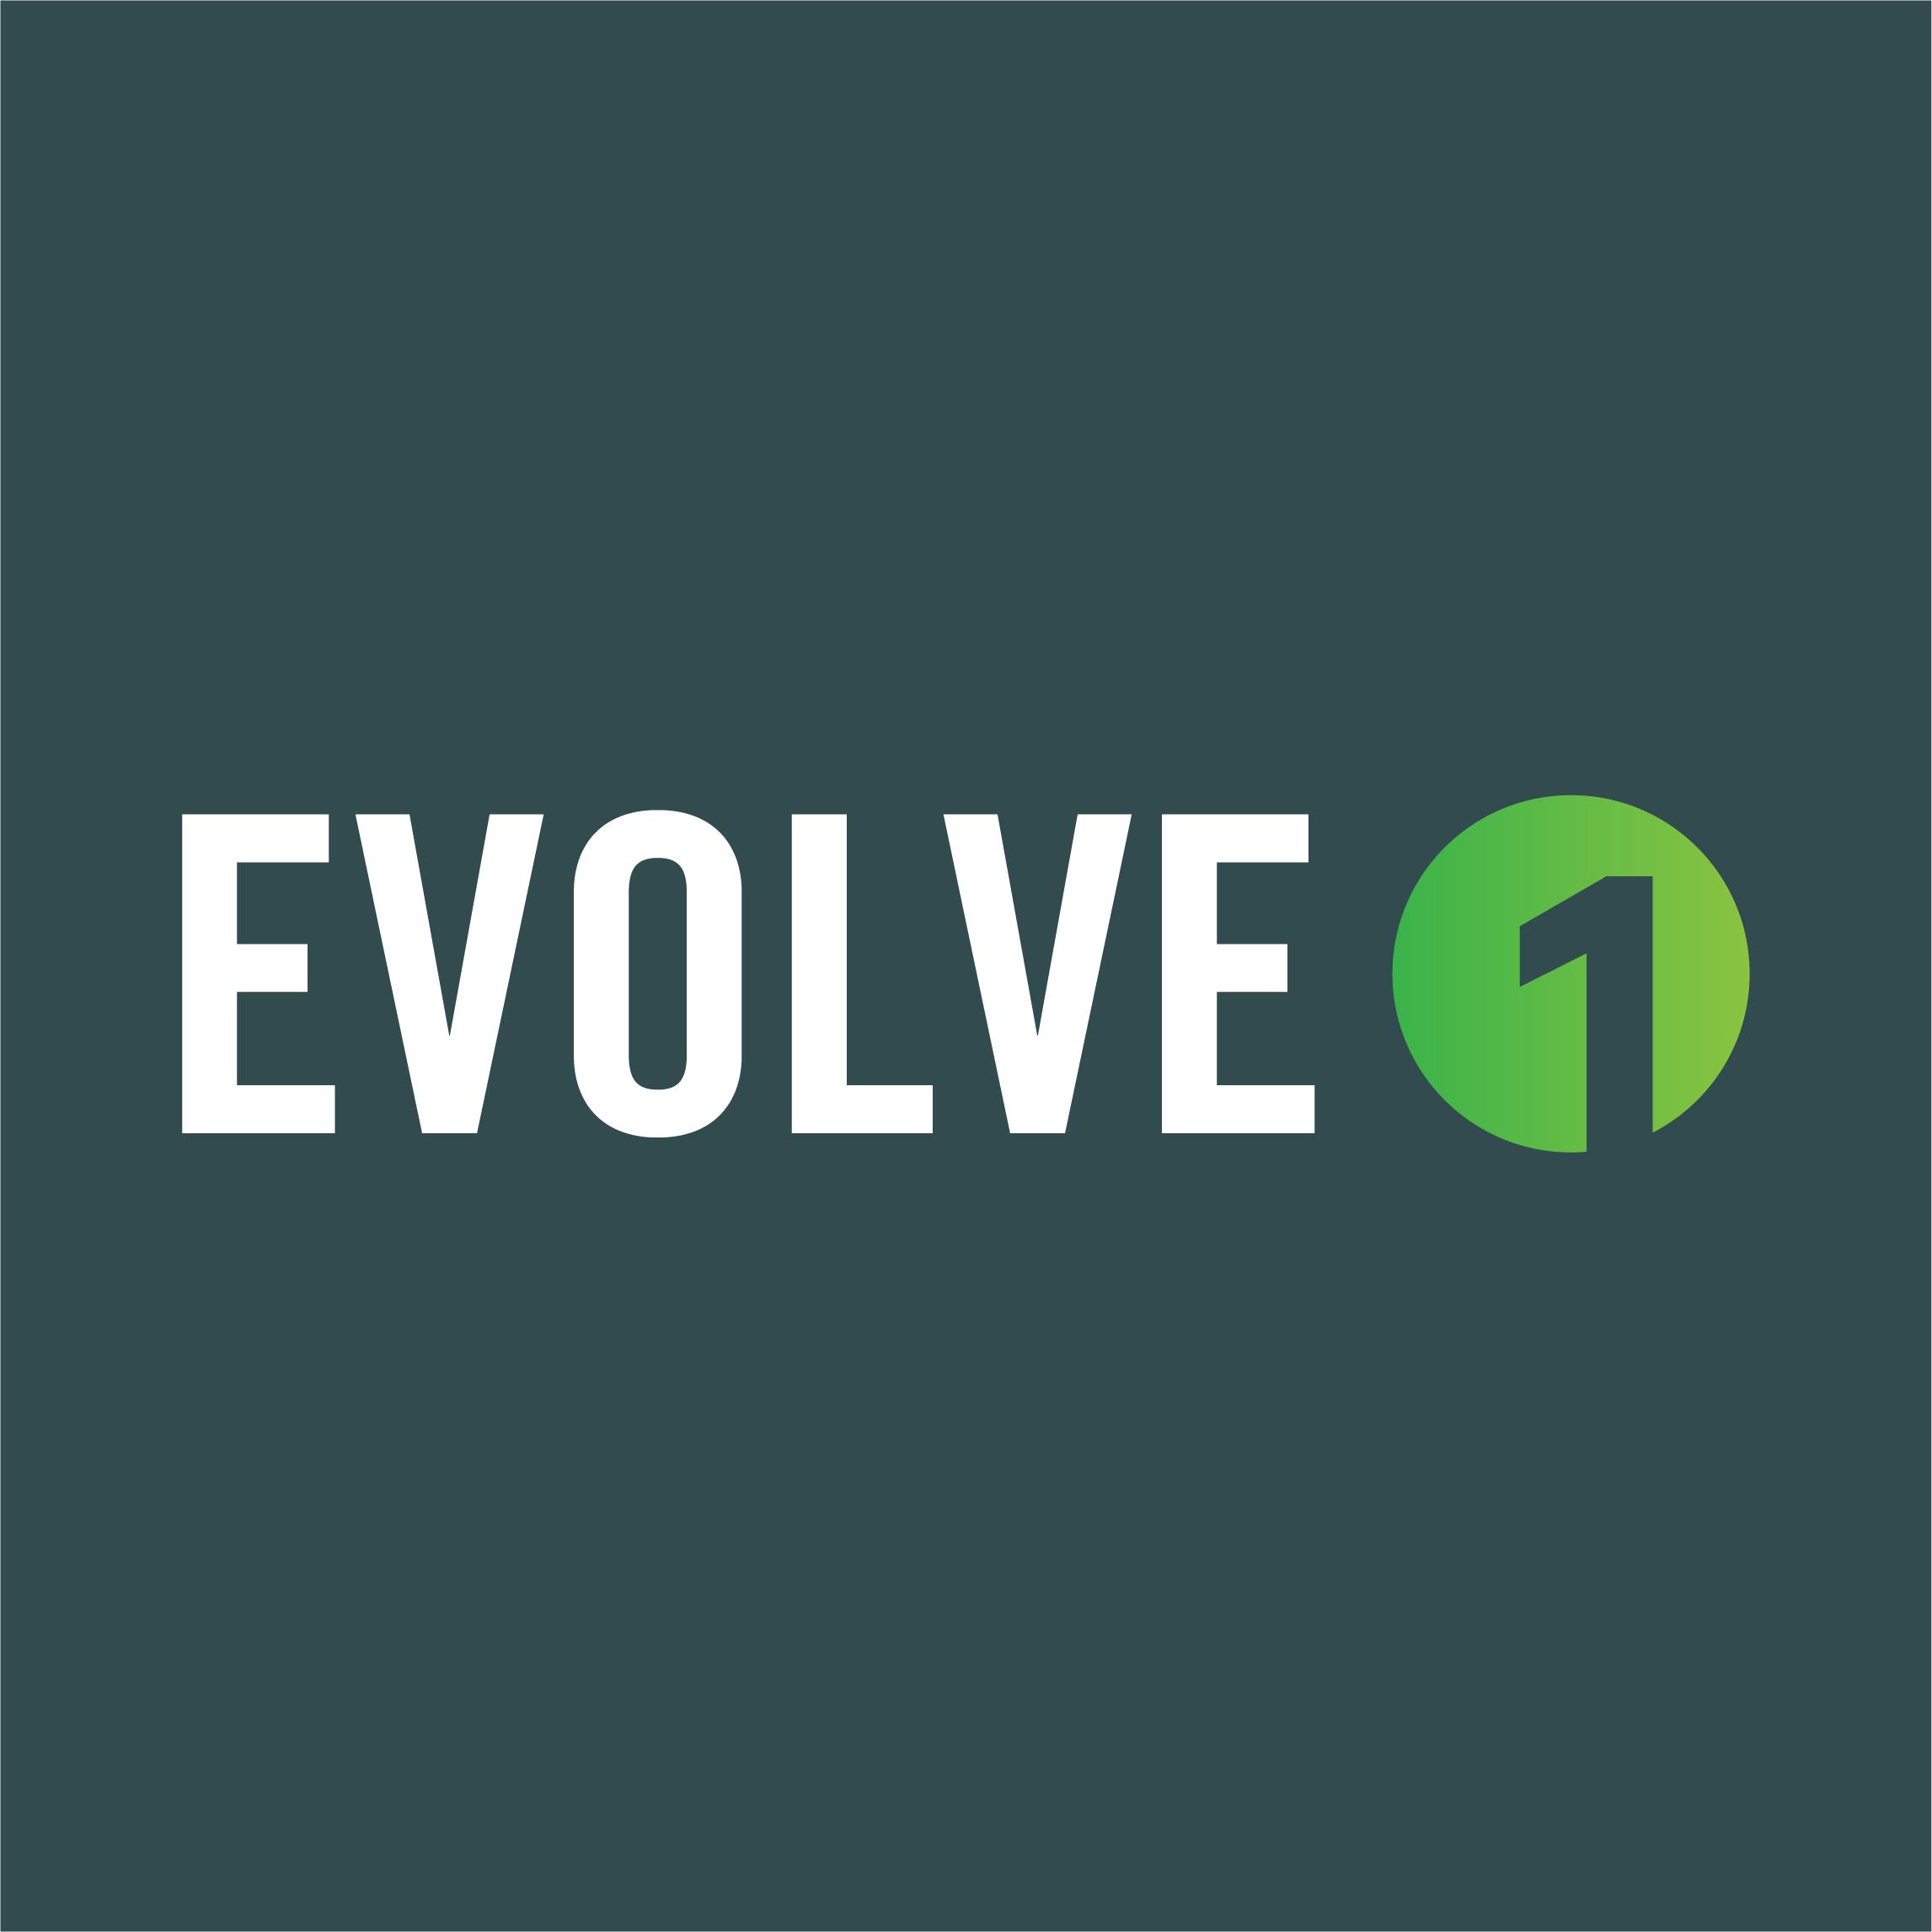 Evolve1-Portfolio-03.png